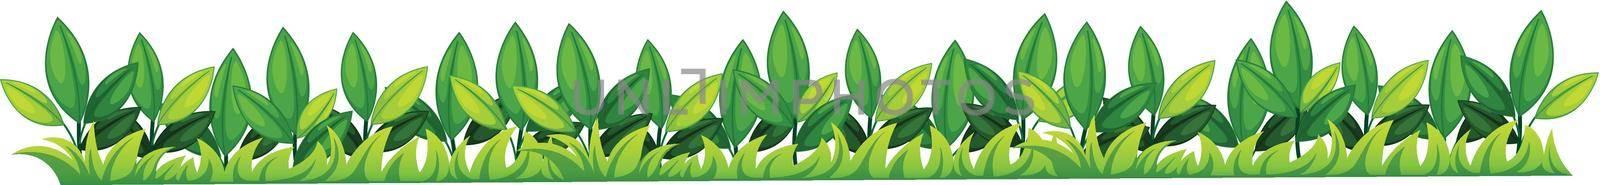 Illustration of a grass texture